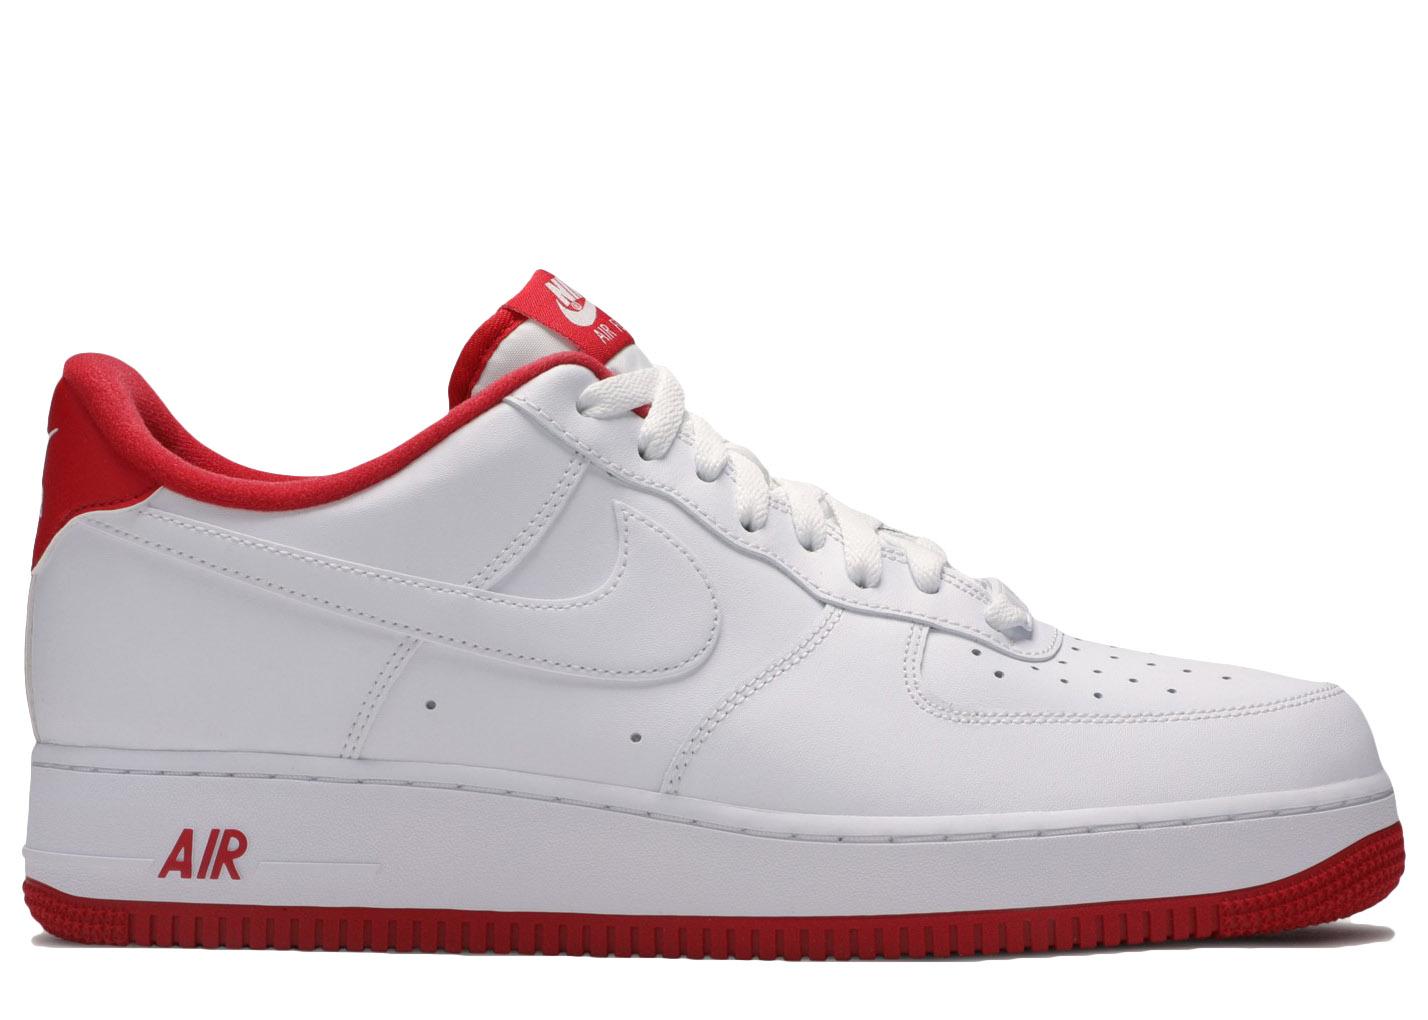 Nike Air Force 1 Low White University